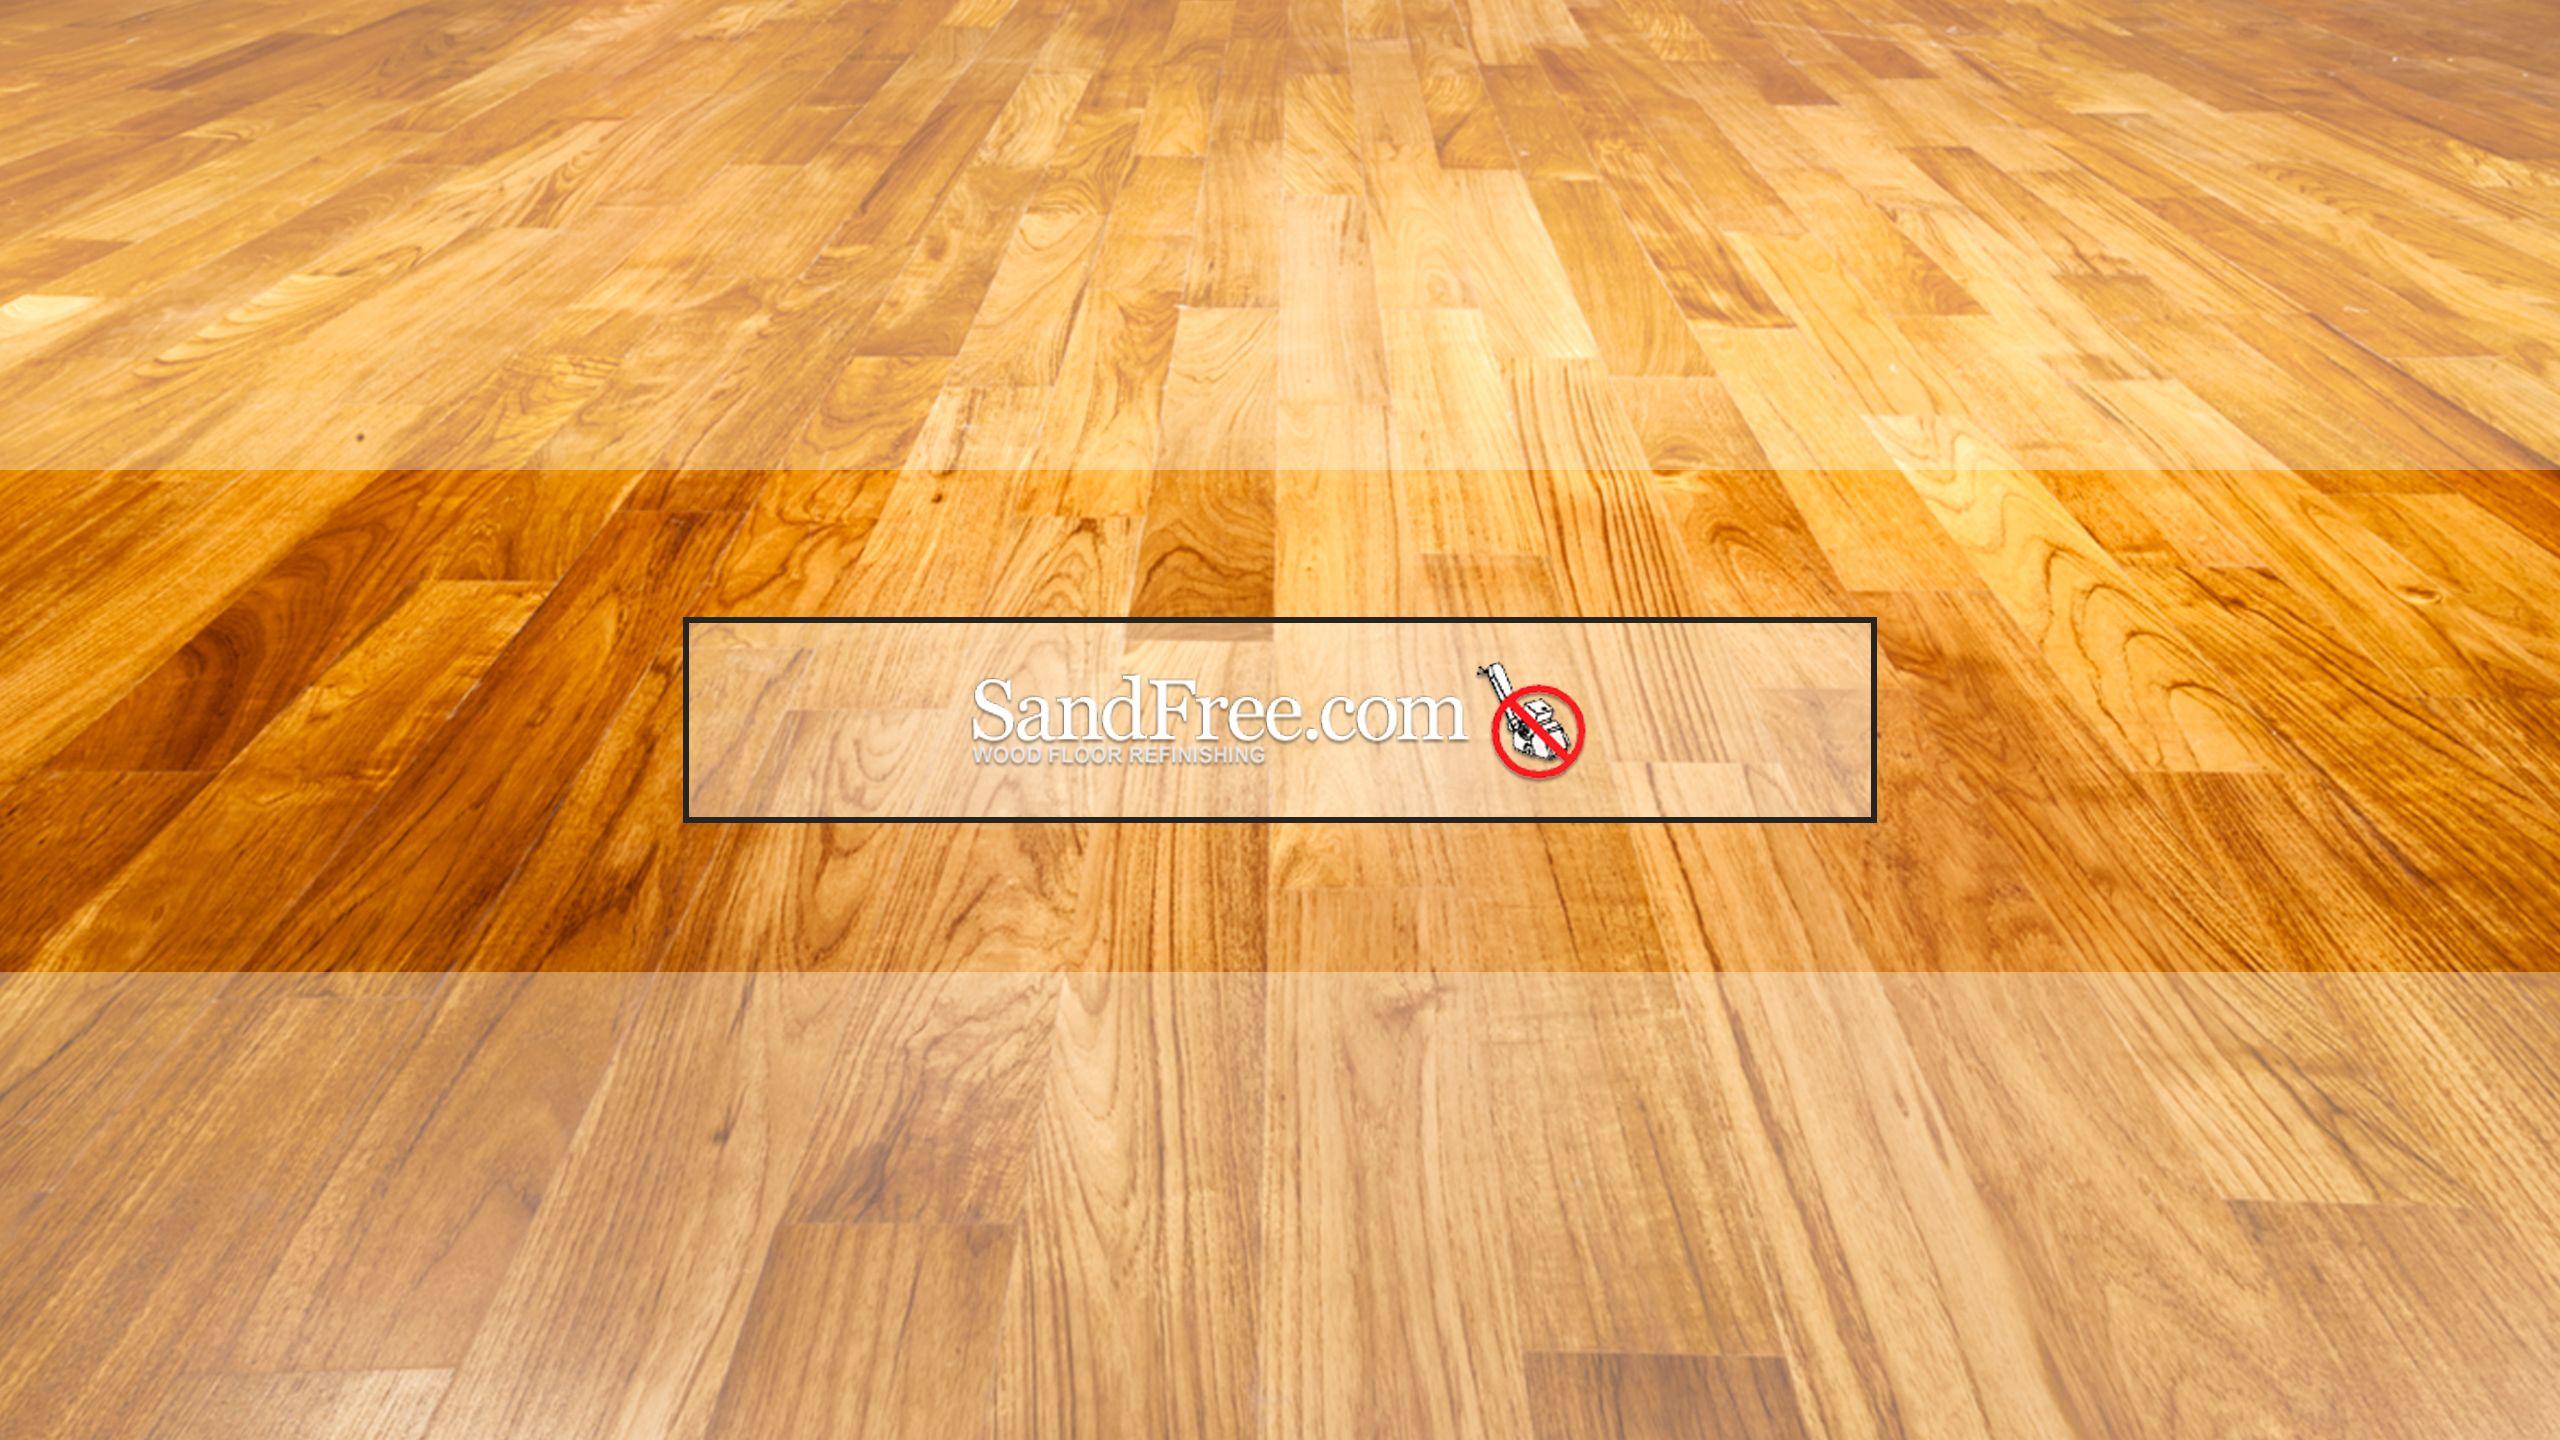 Sandfree Llc Is A Hardwood Flooring Company In Baltimore Md We Offer Hardwood Flooring Refinish Hardwood Floors Installing Hardwood Floors Refinishing Floors